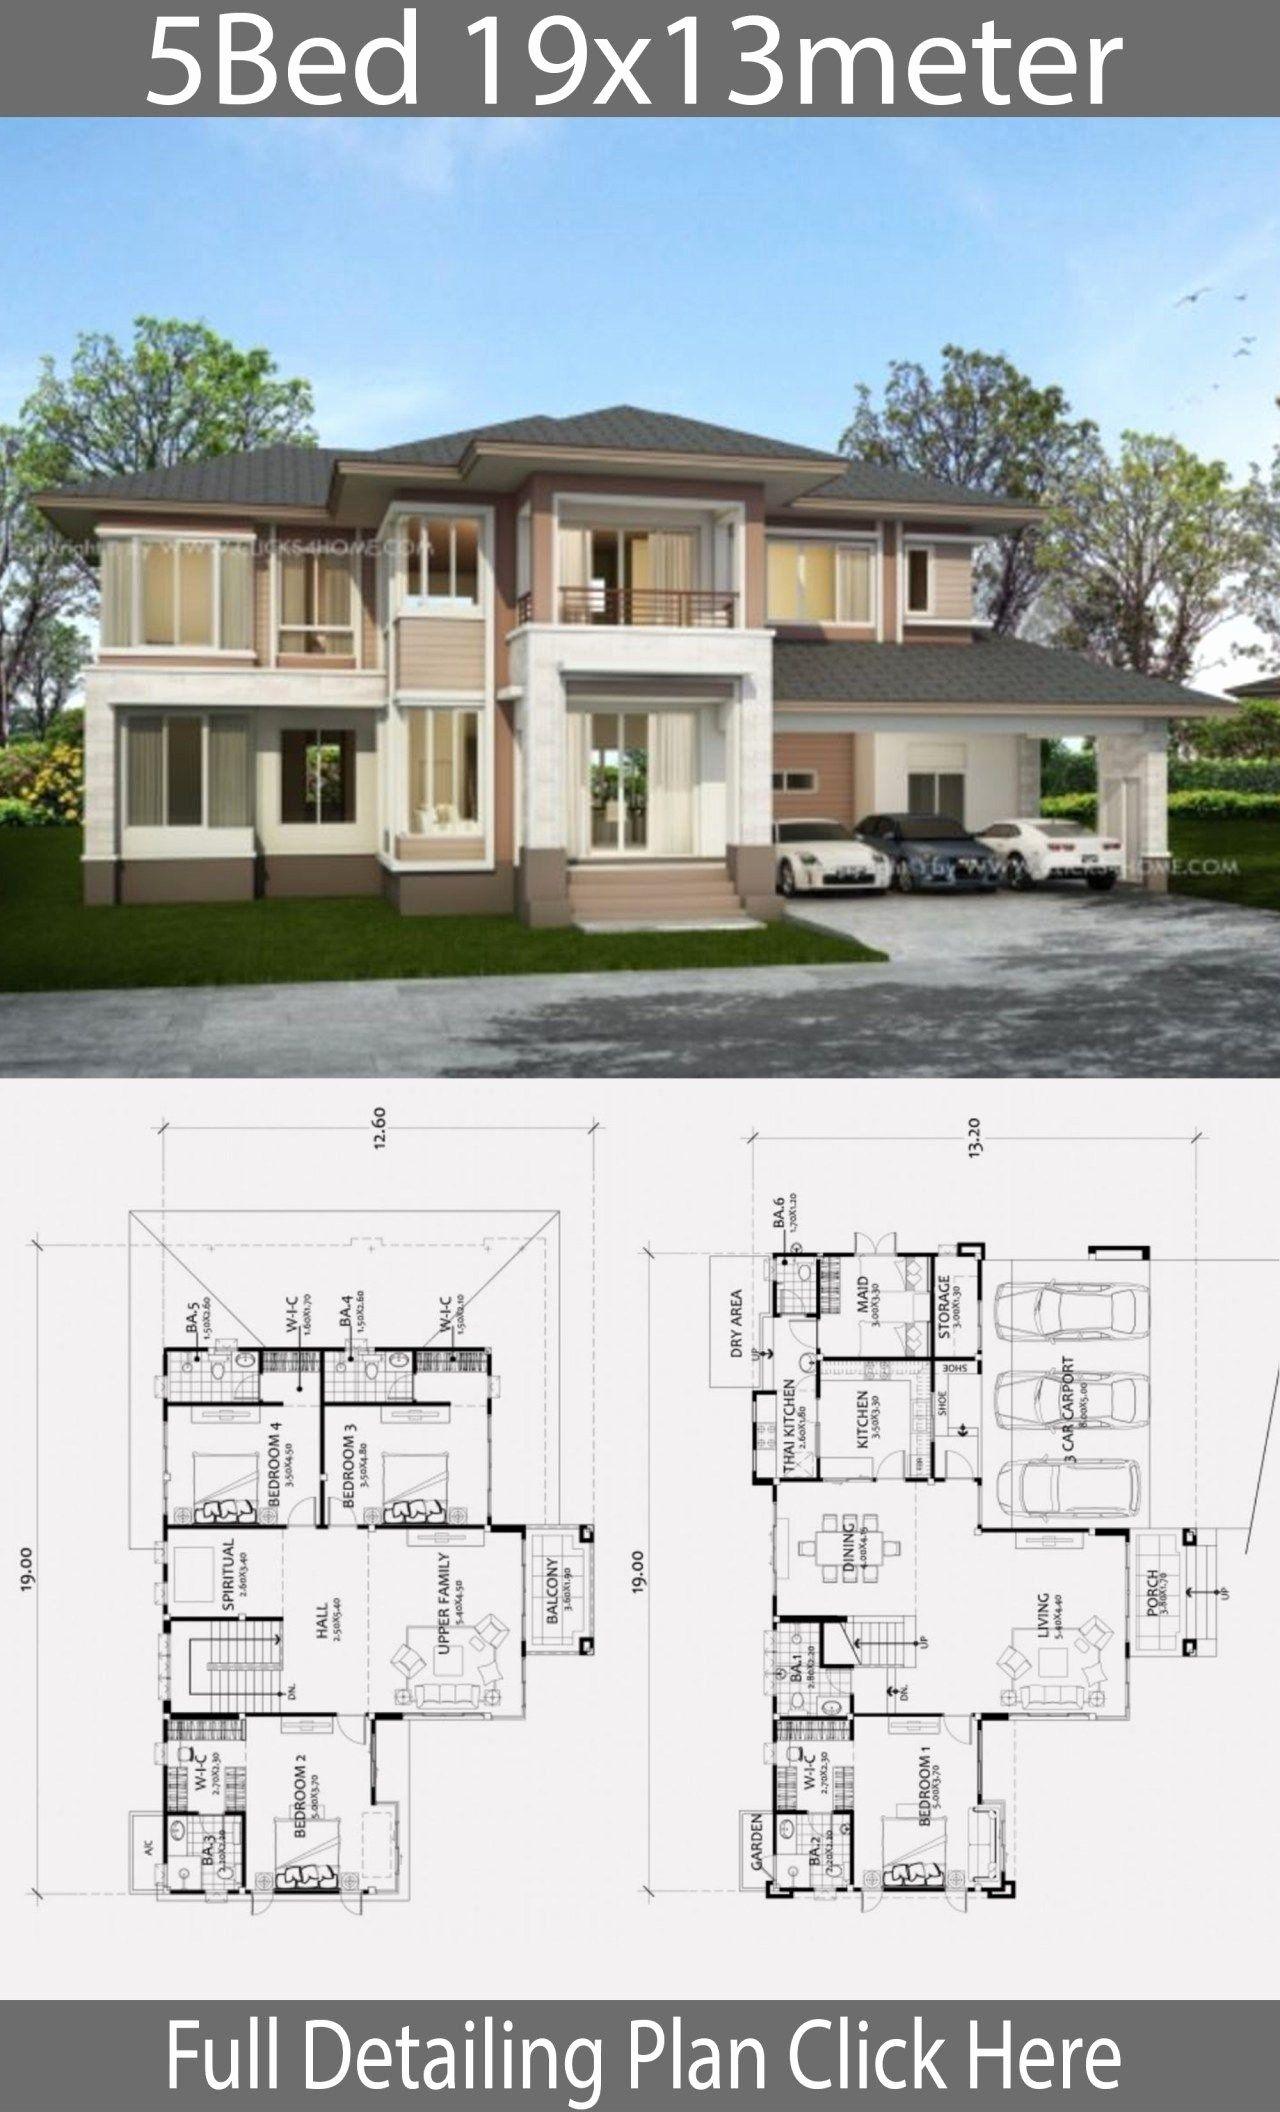 5 Bedroom Bungalow House Plans Luxury Home Design Plan 19x13m With 5 Bedrooms In 2020 Bungalow House Plans Beautiful House Plans House Architecture Design